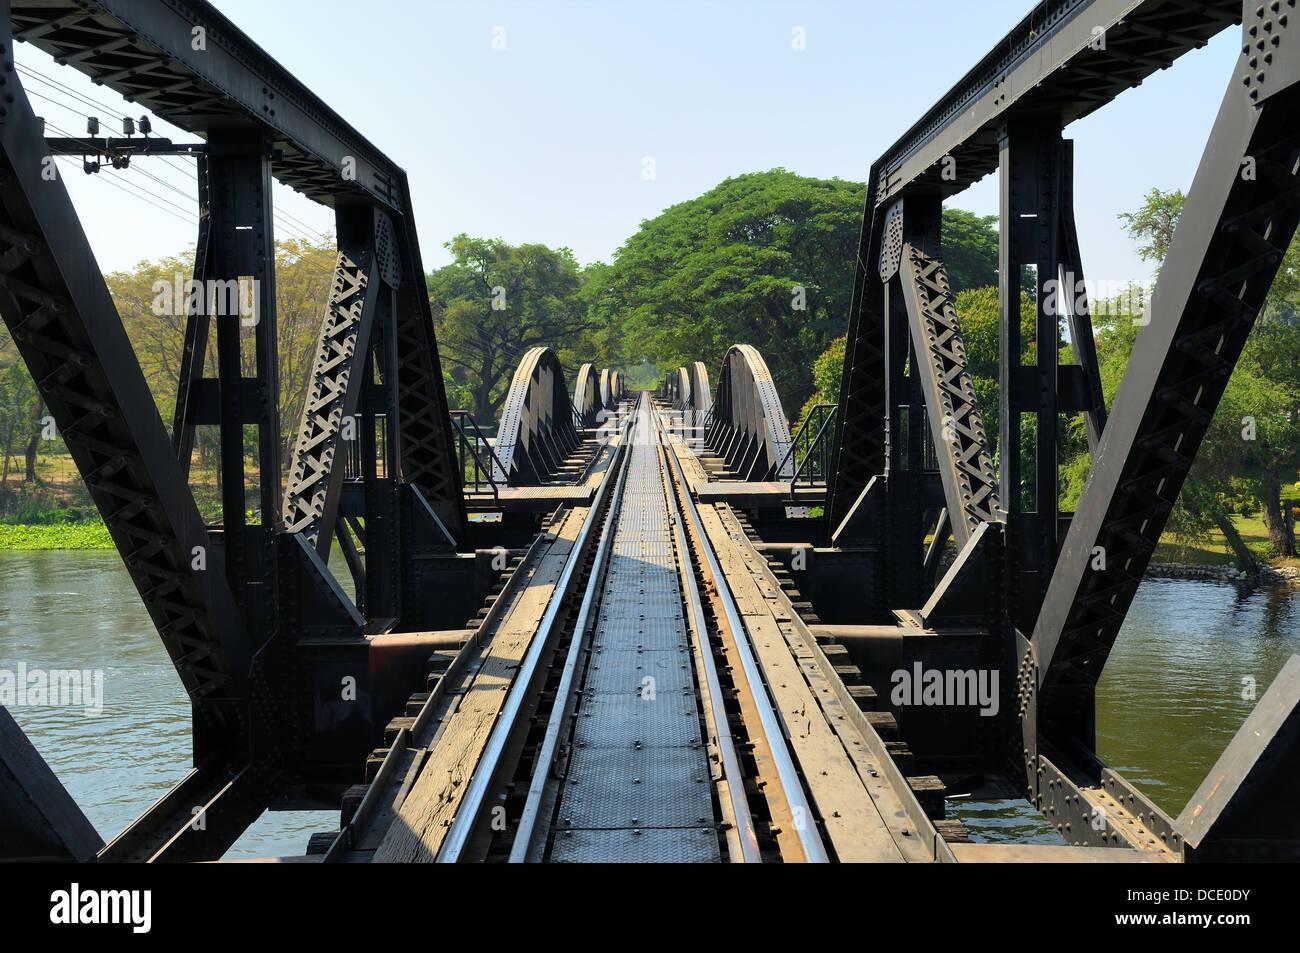 Bridge through river Kwai on Death Railway between Thailand and Burma - Stock Image